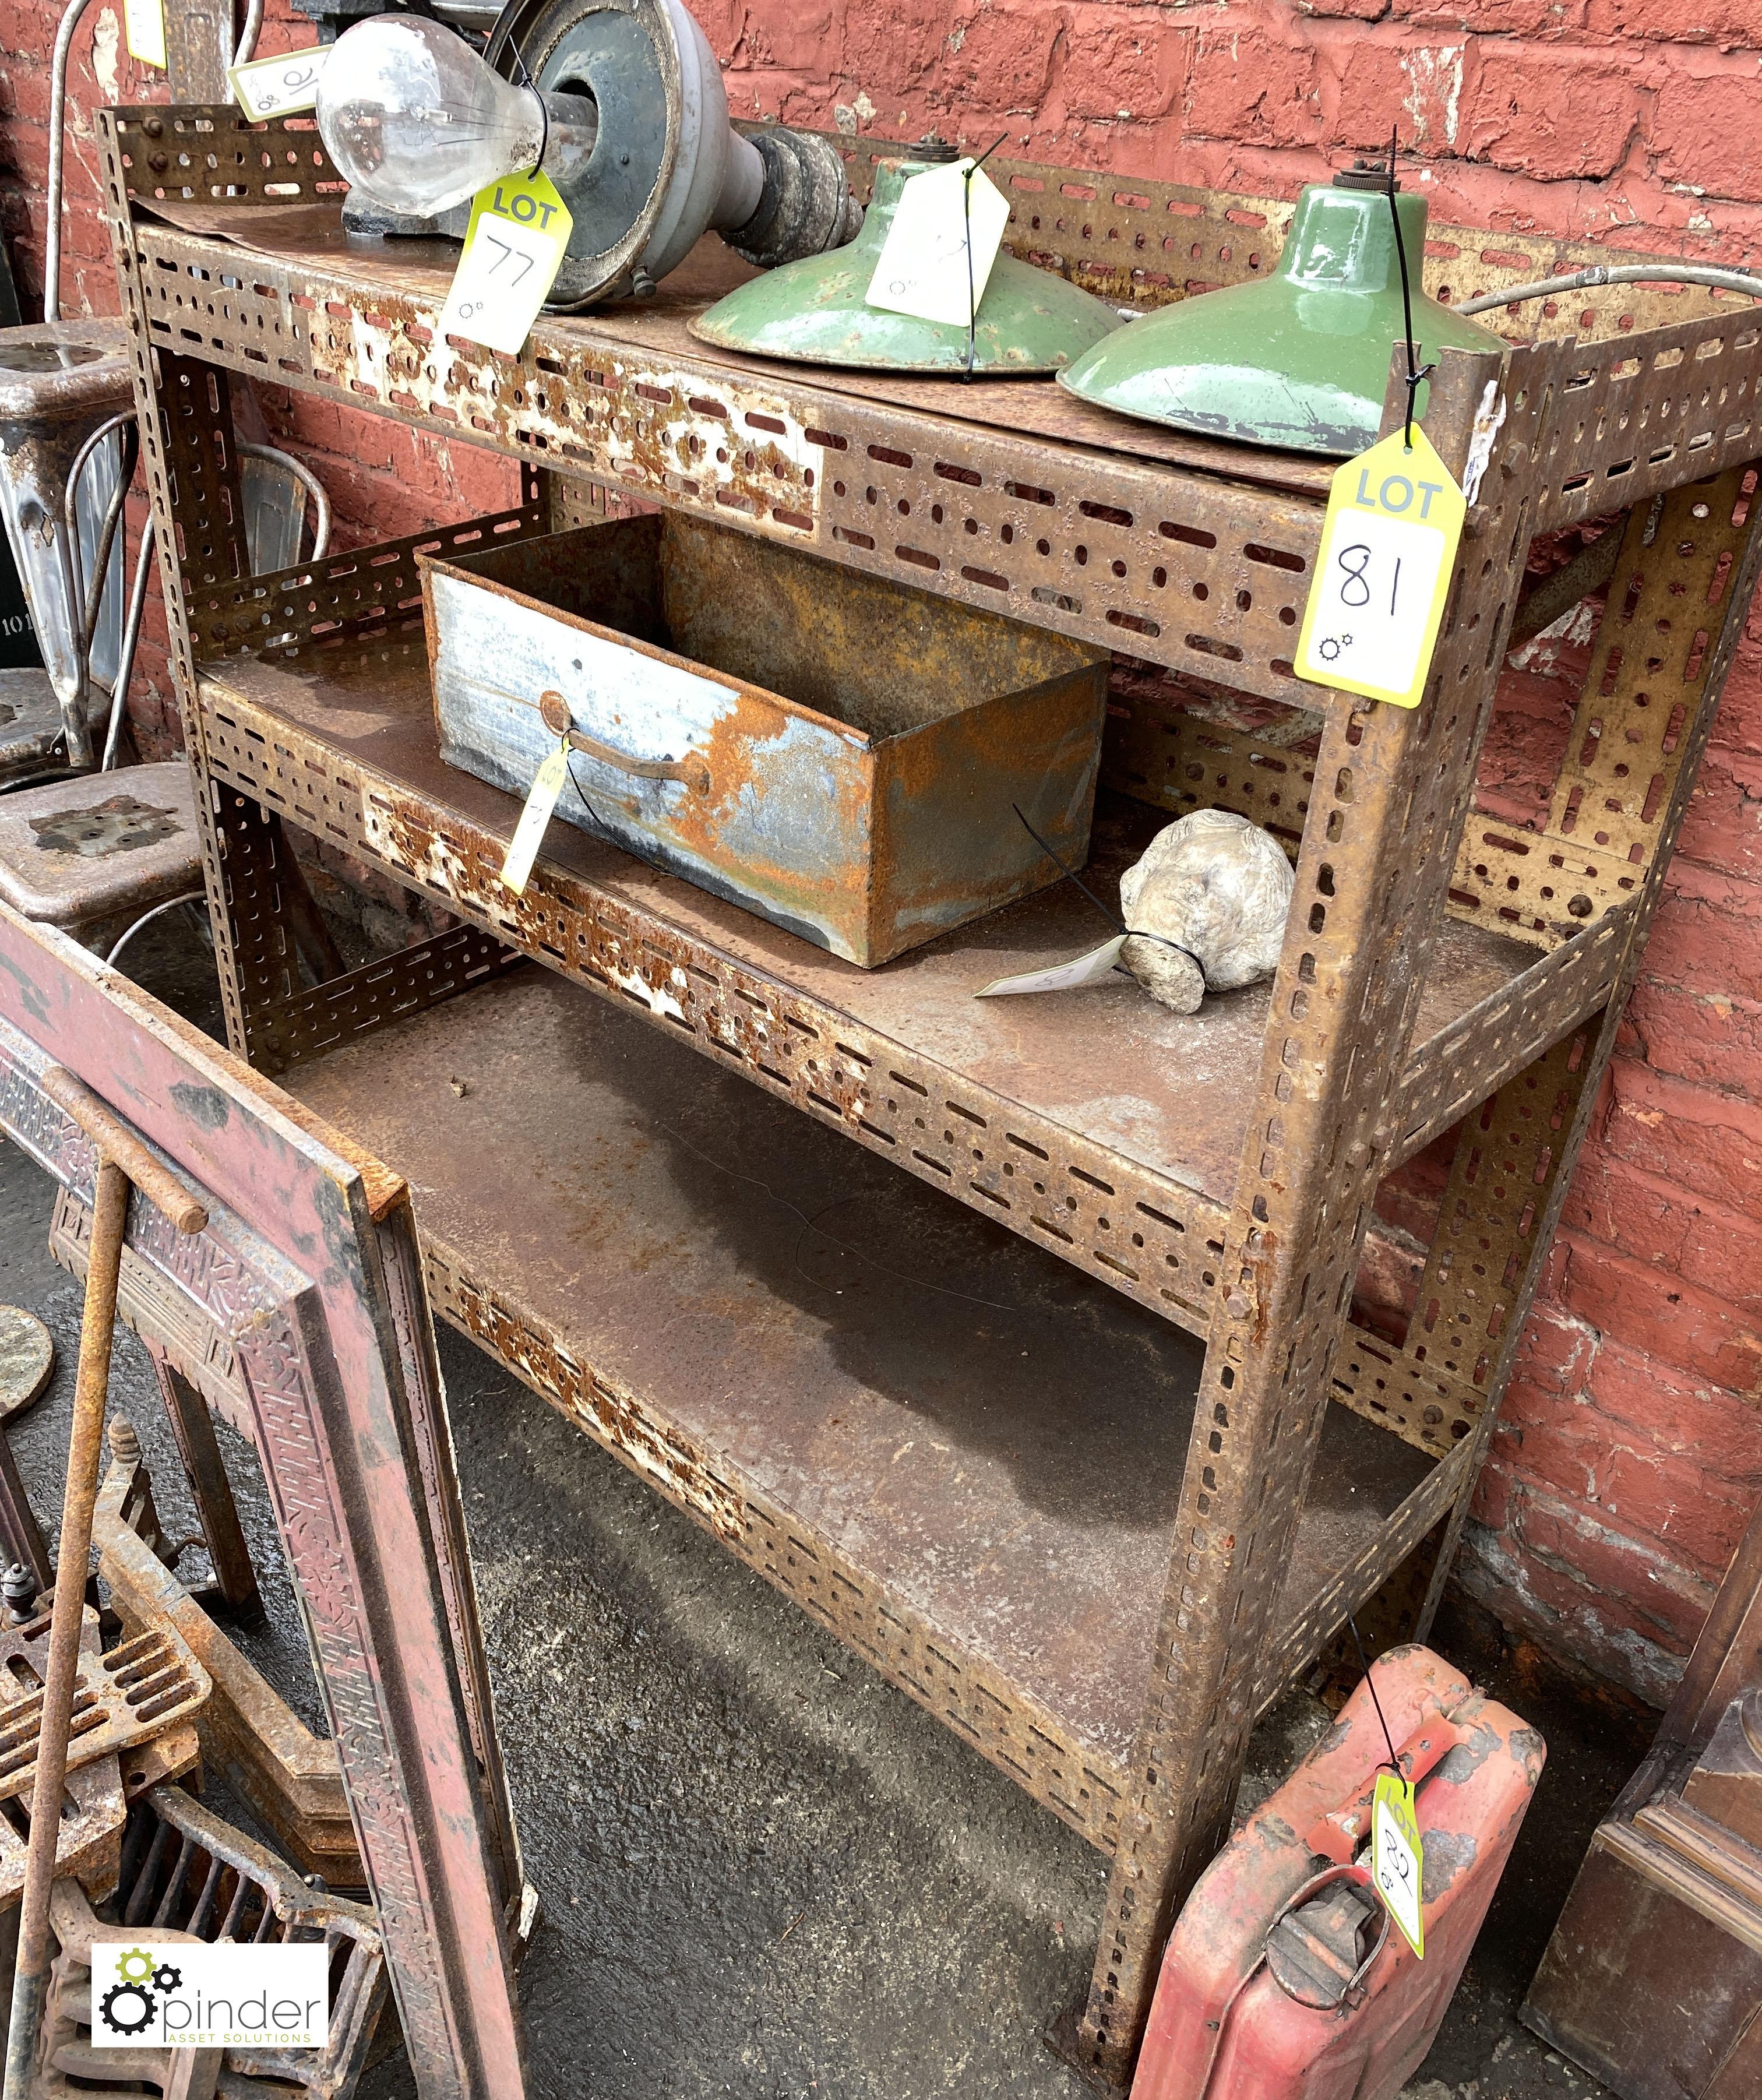 Steel adjustable 3-shelf Rack, 1240mm x 460mm x 1290mm tall (LOCATION: Sussex Street, Sheffield) - Image 2 of 2